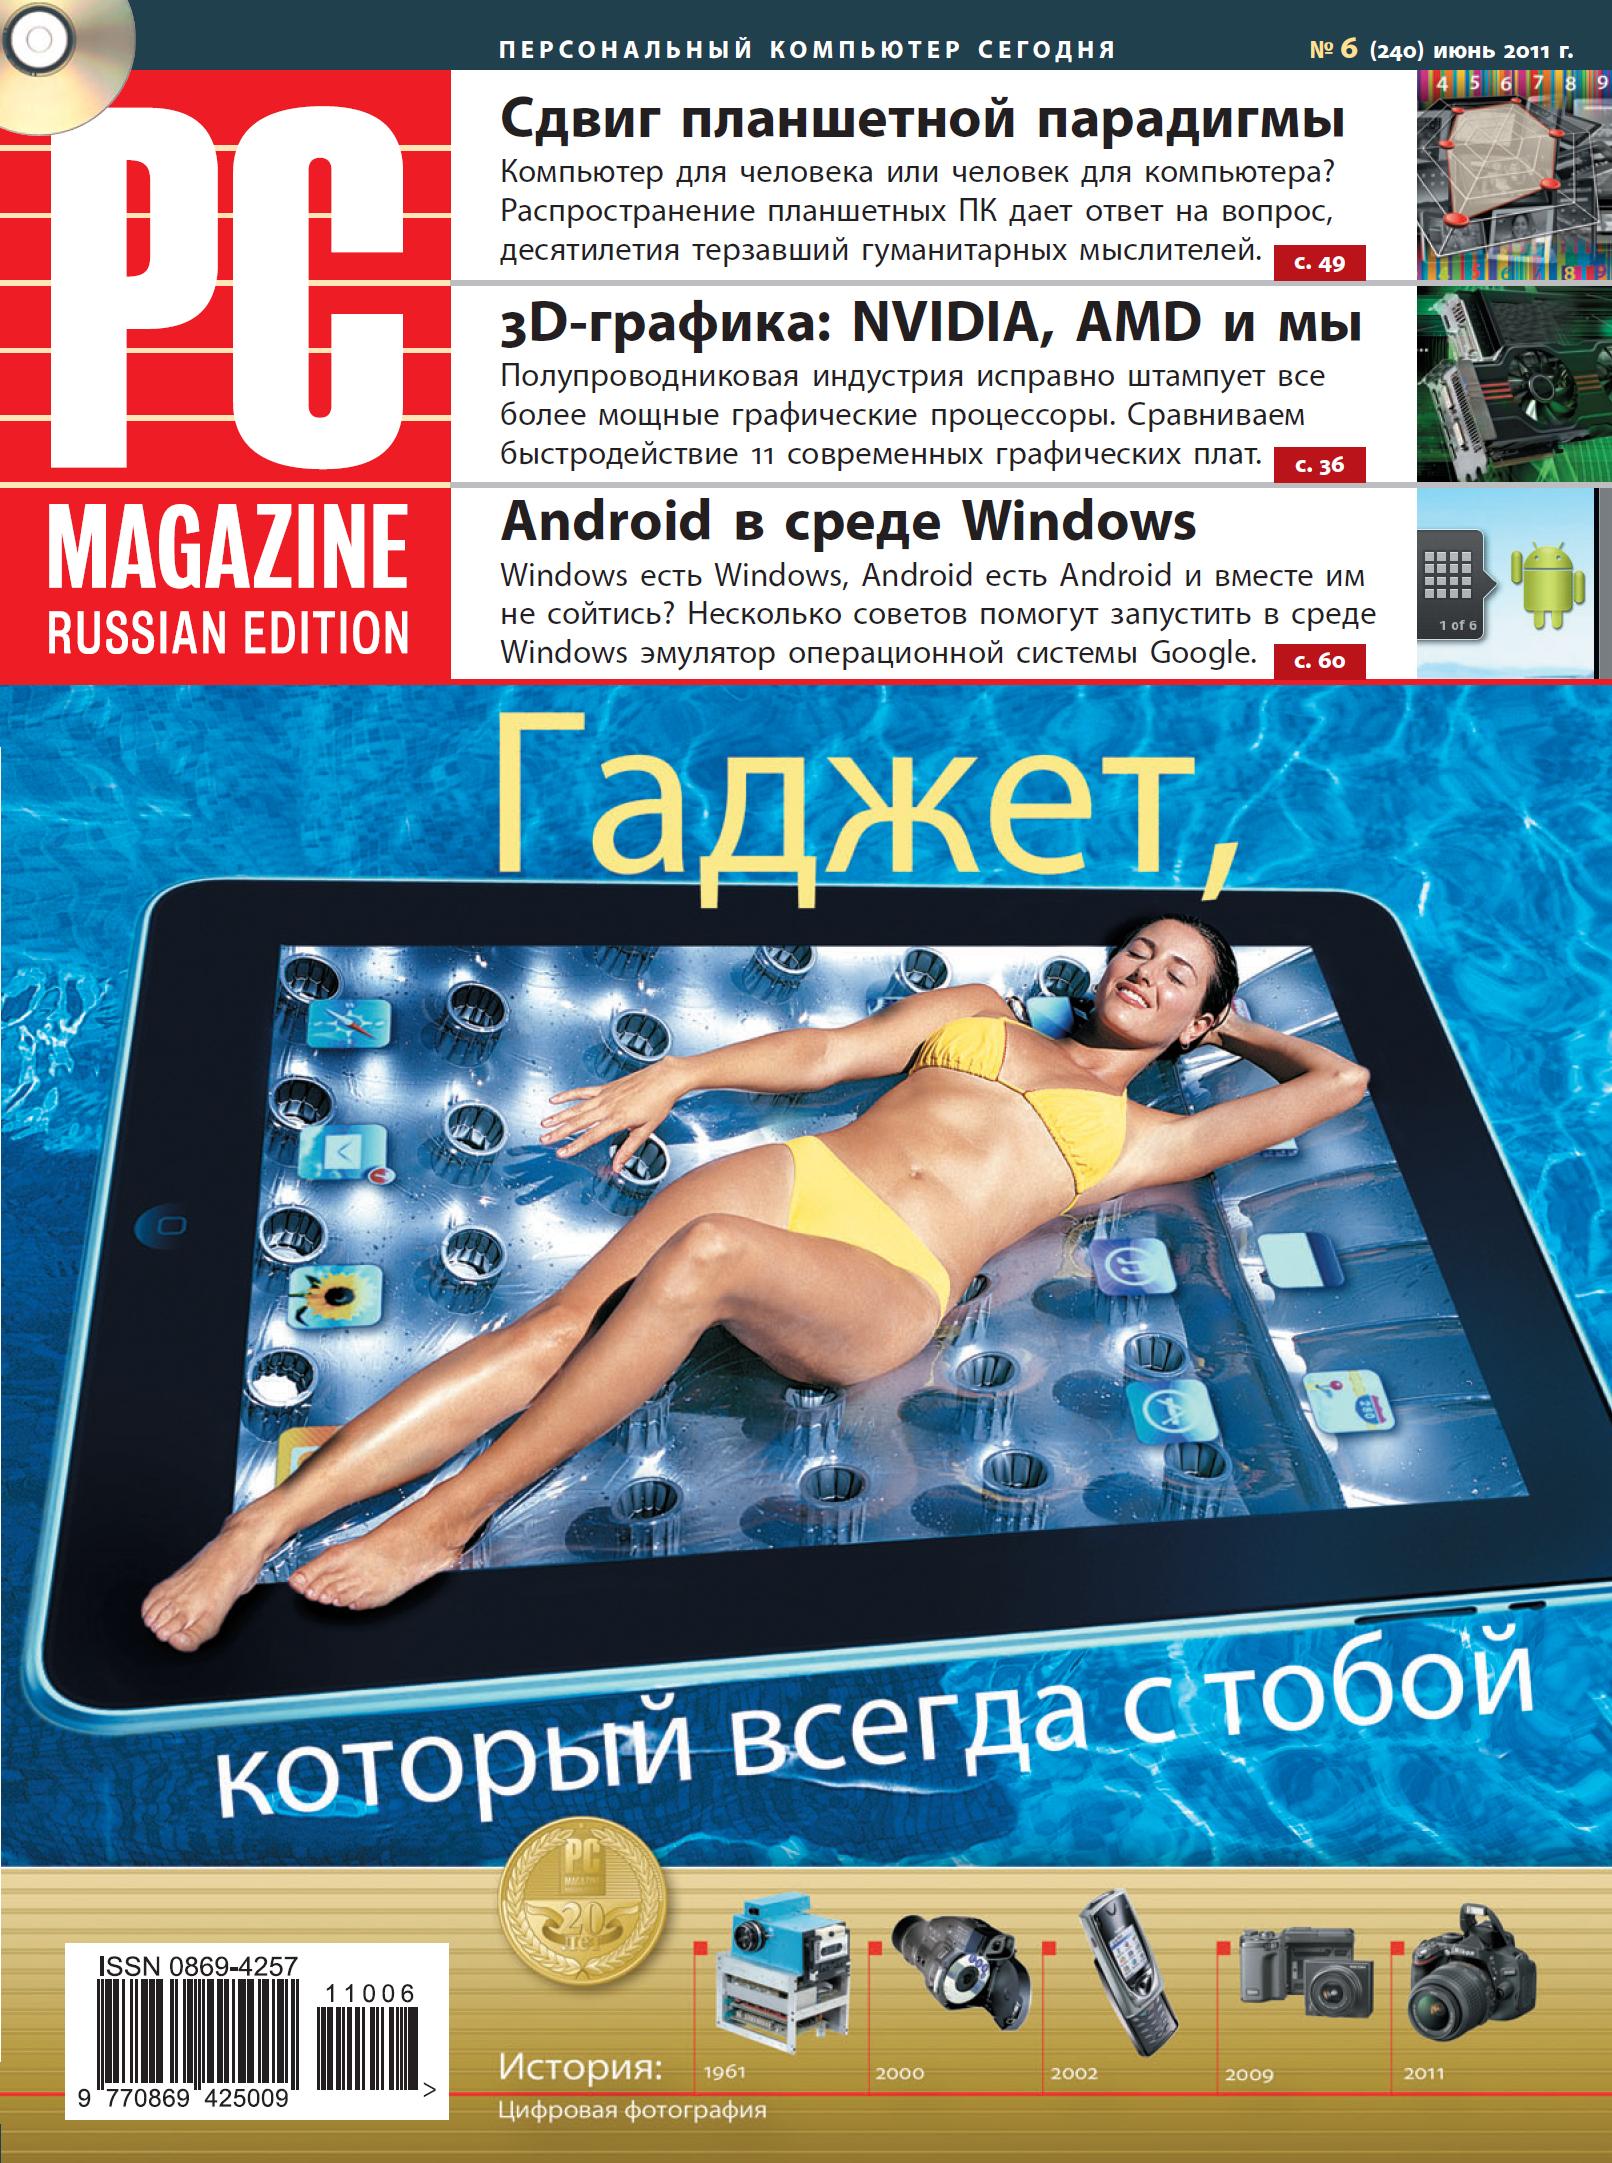 Журнал PC Magazine/RE №6/2011